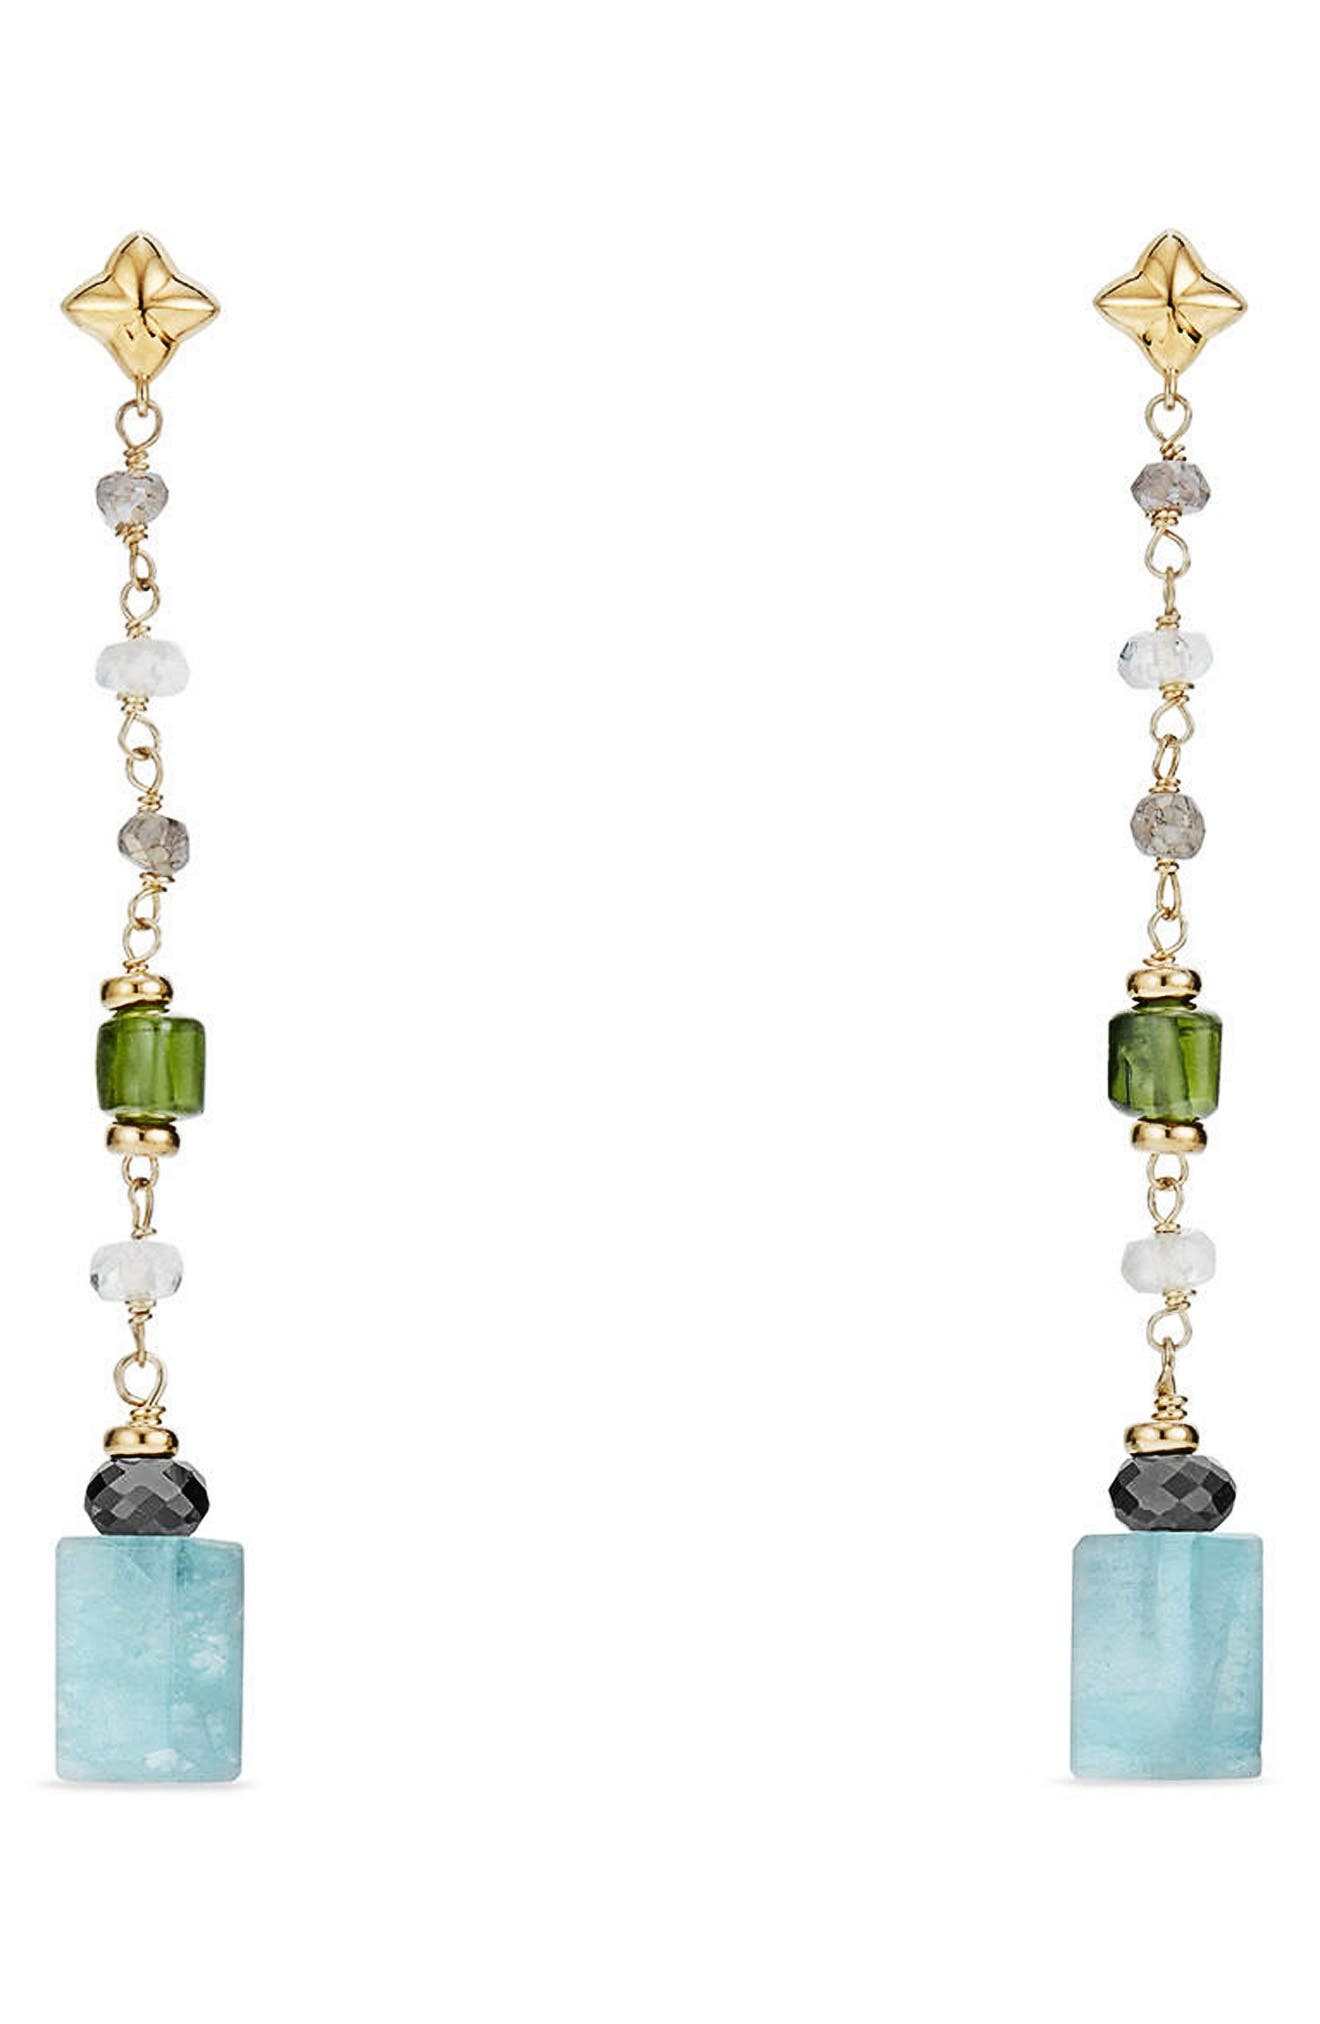 Main Image - David Yurman Bead & Chain Earrings with Semiprecious Stones